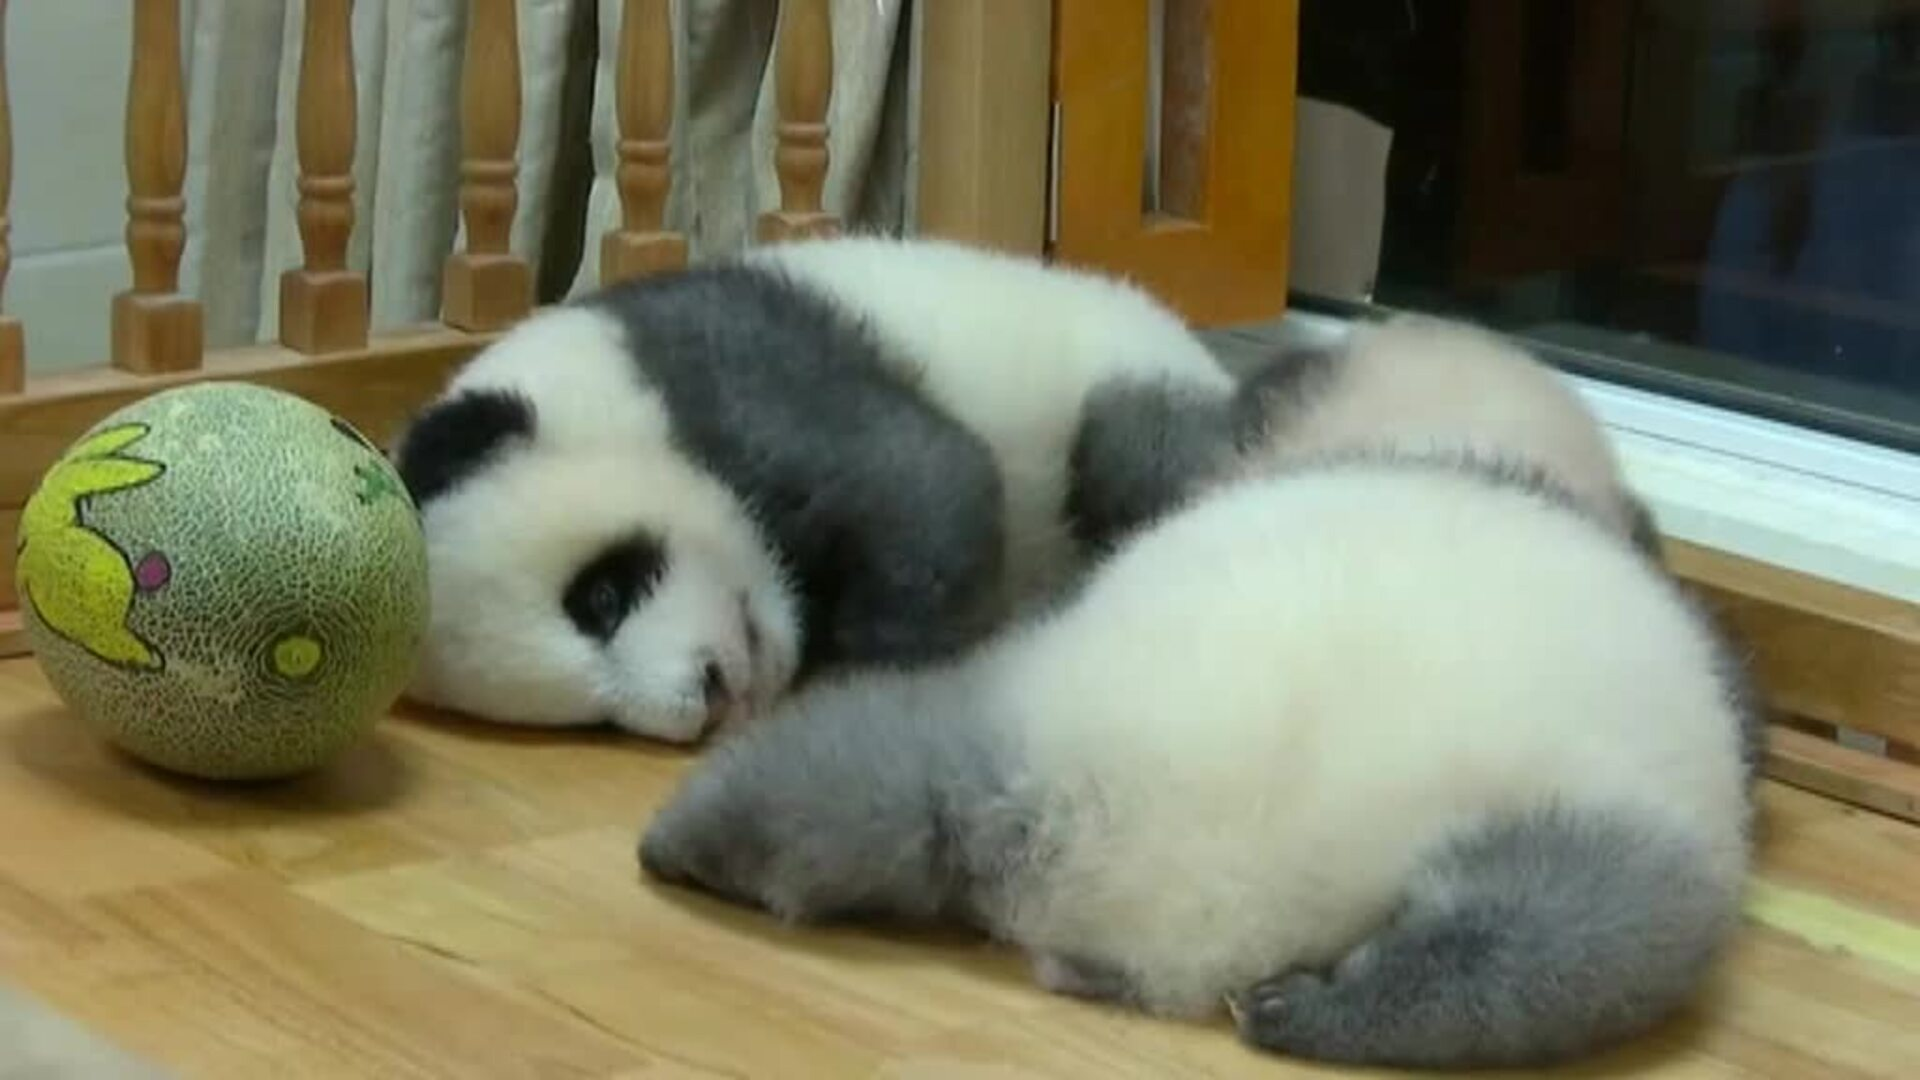 Nace en China un singular panda de pelaje gris